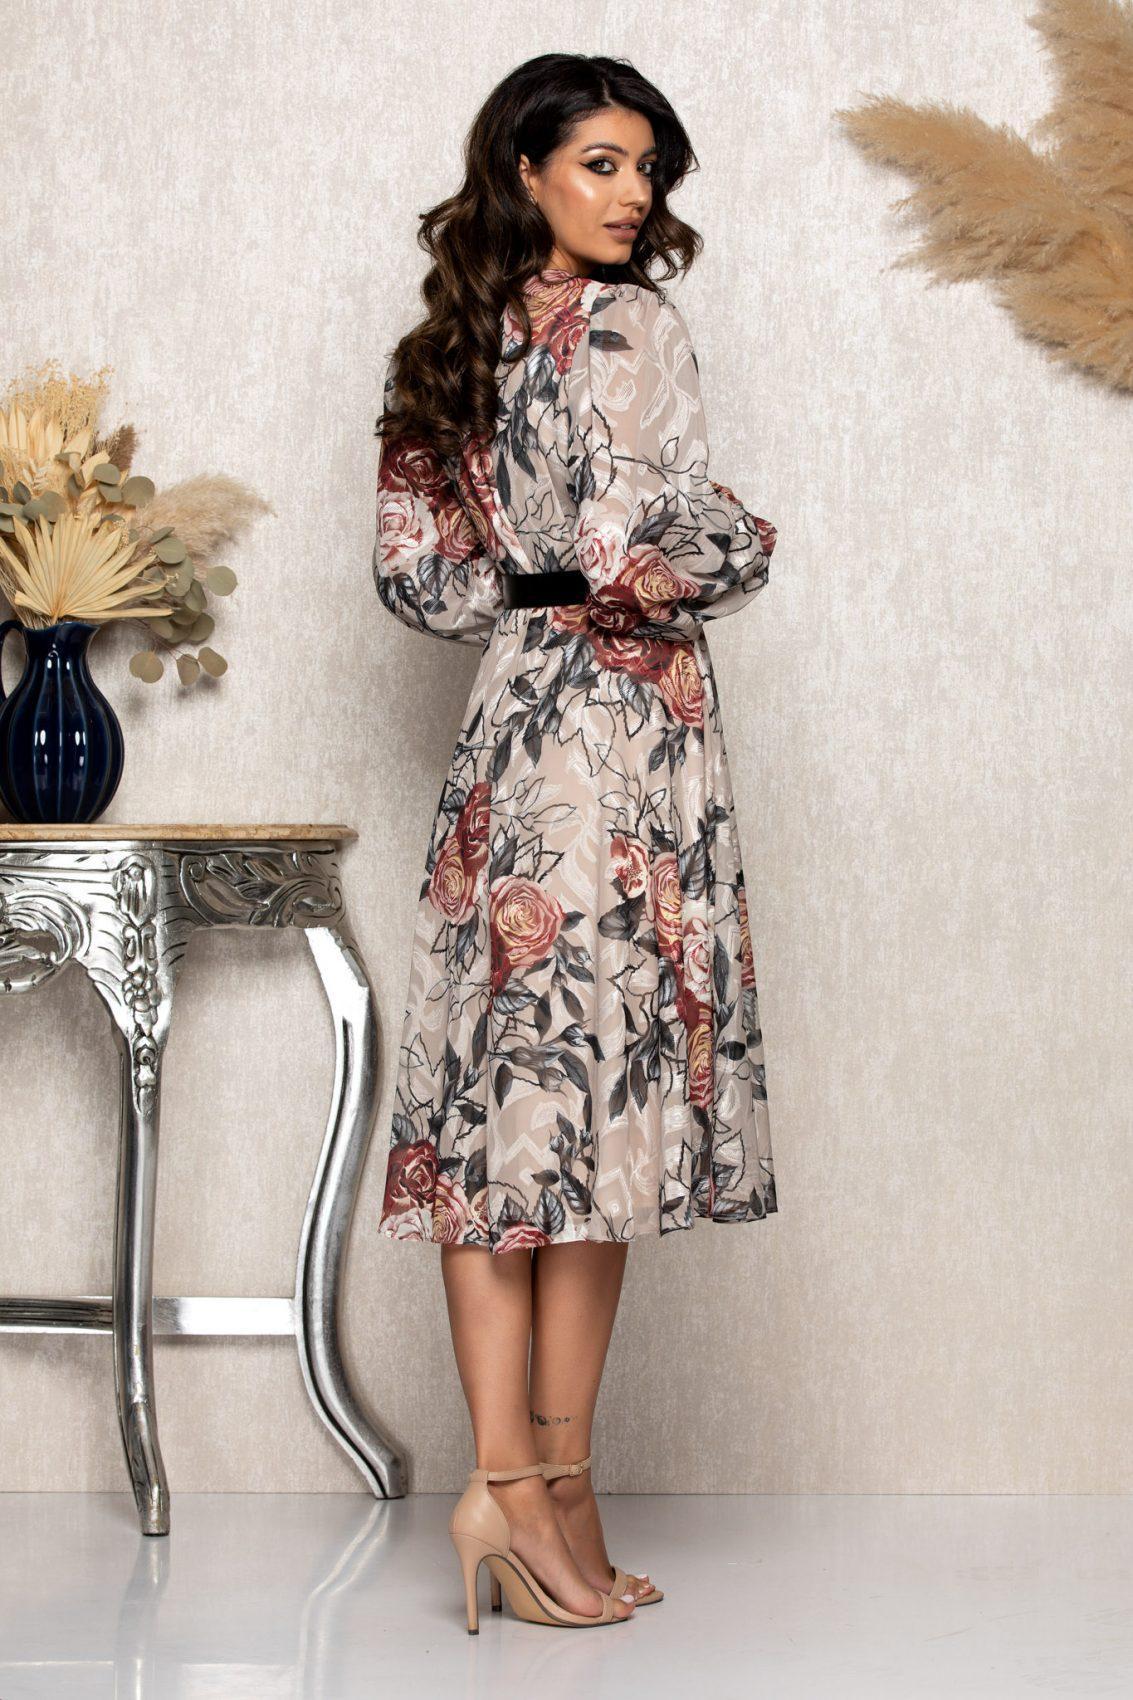 Nude Μίντι Φλοράλ Βραδινό Φόρεμα Andra B107 2